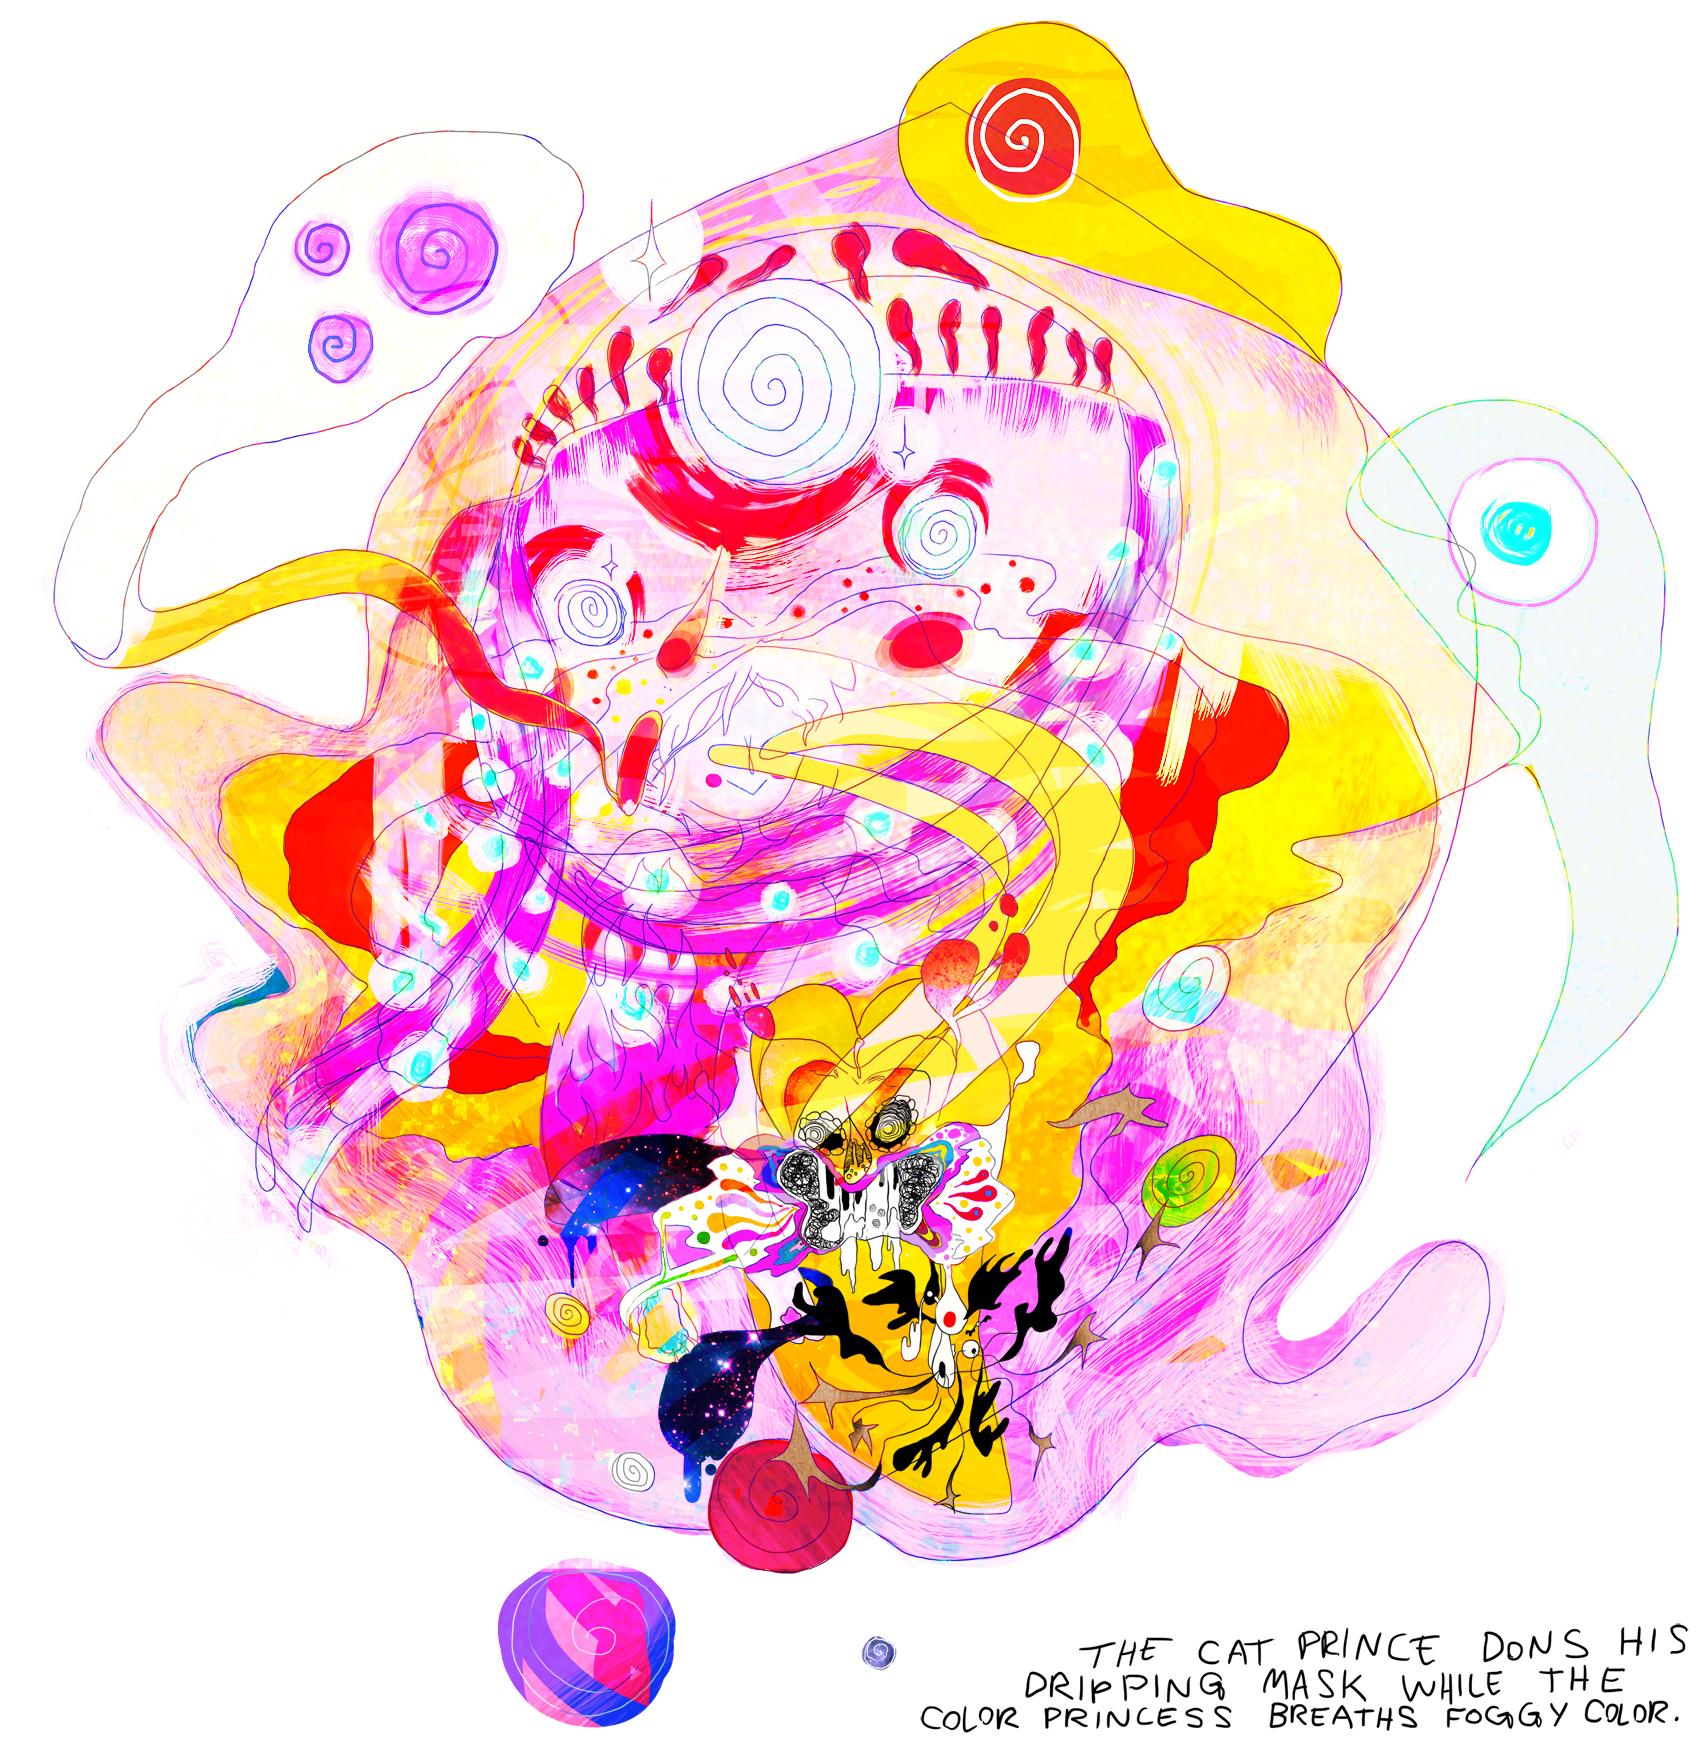 catprince,colorprincess